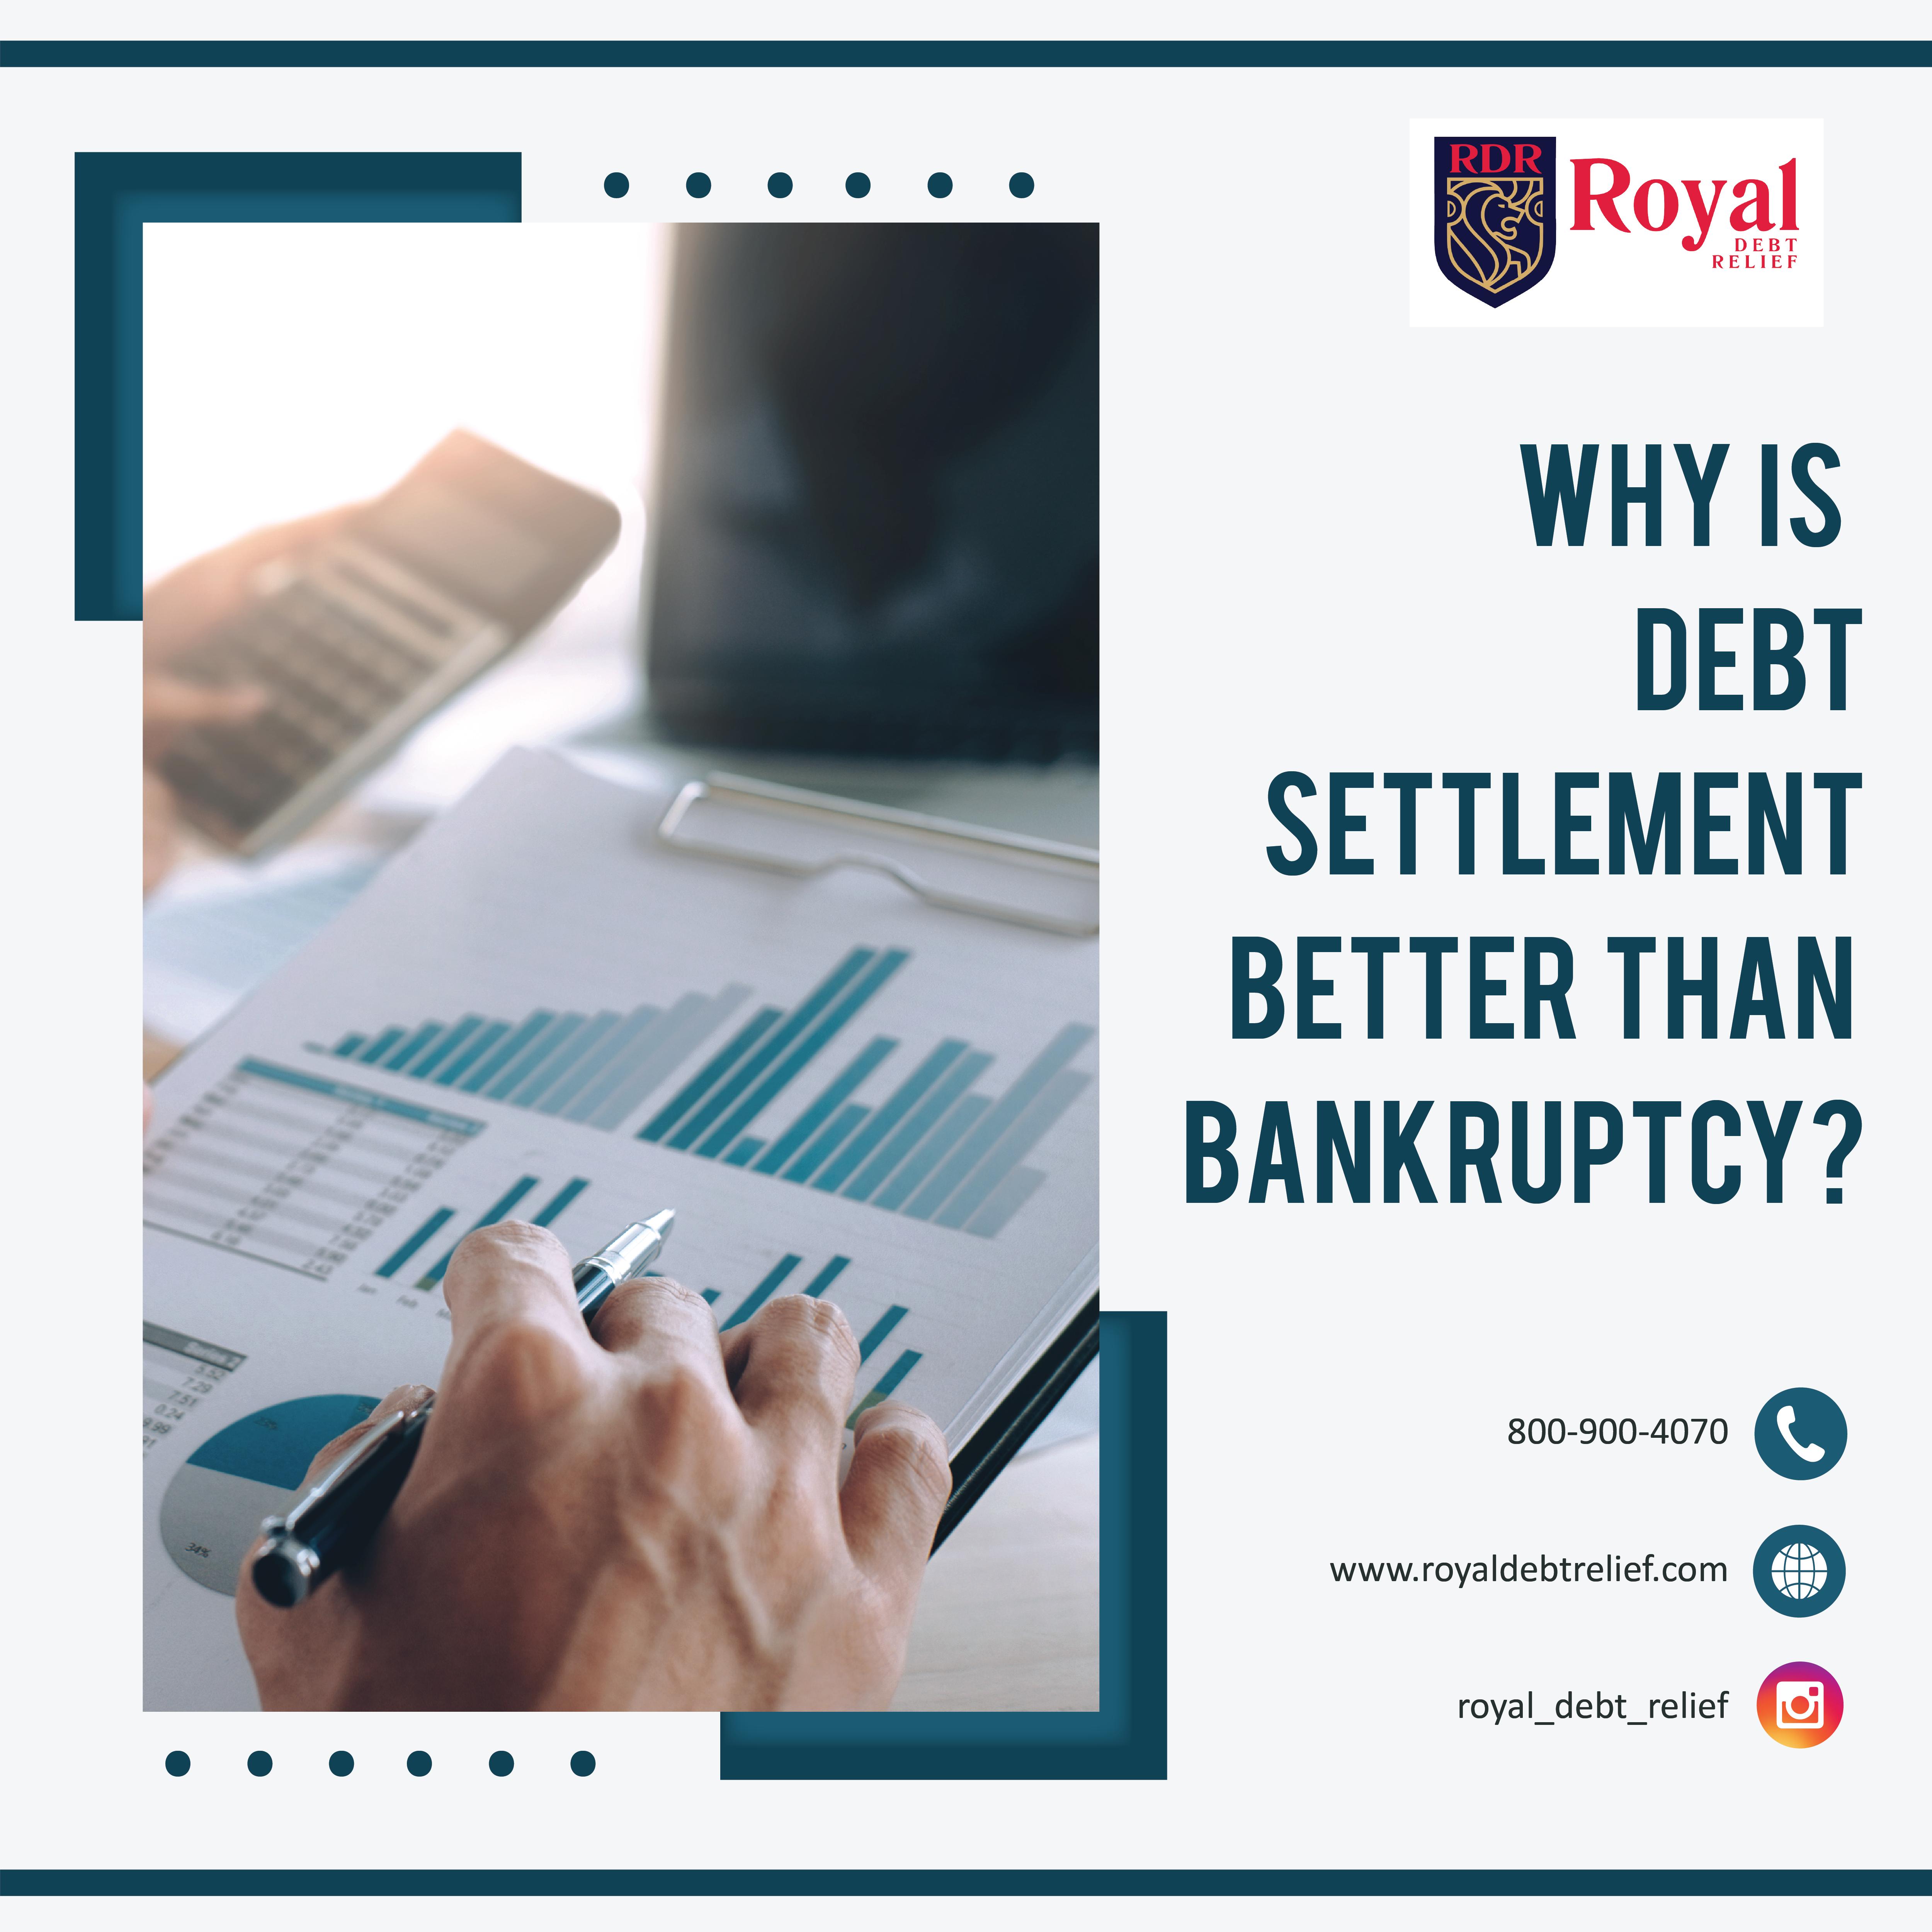 Debt Settlement Vs Bankruptcy In 2020 Debt Settlement Personal Debt Financial Counseling